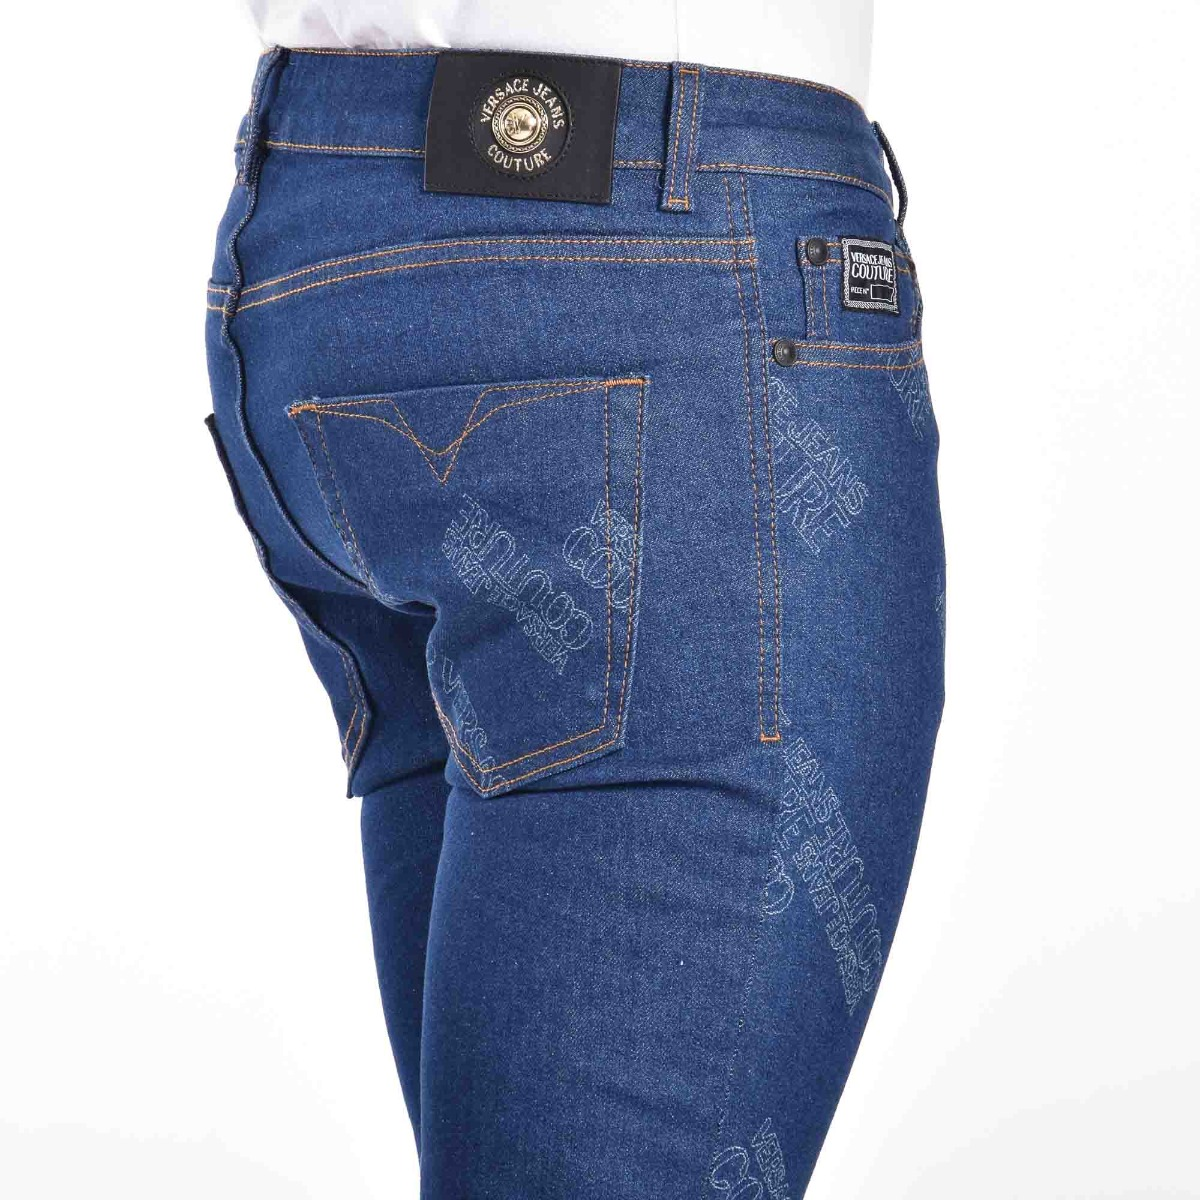 Jeans stampa all over lodo- Denim scuro